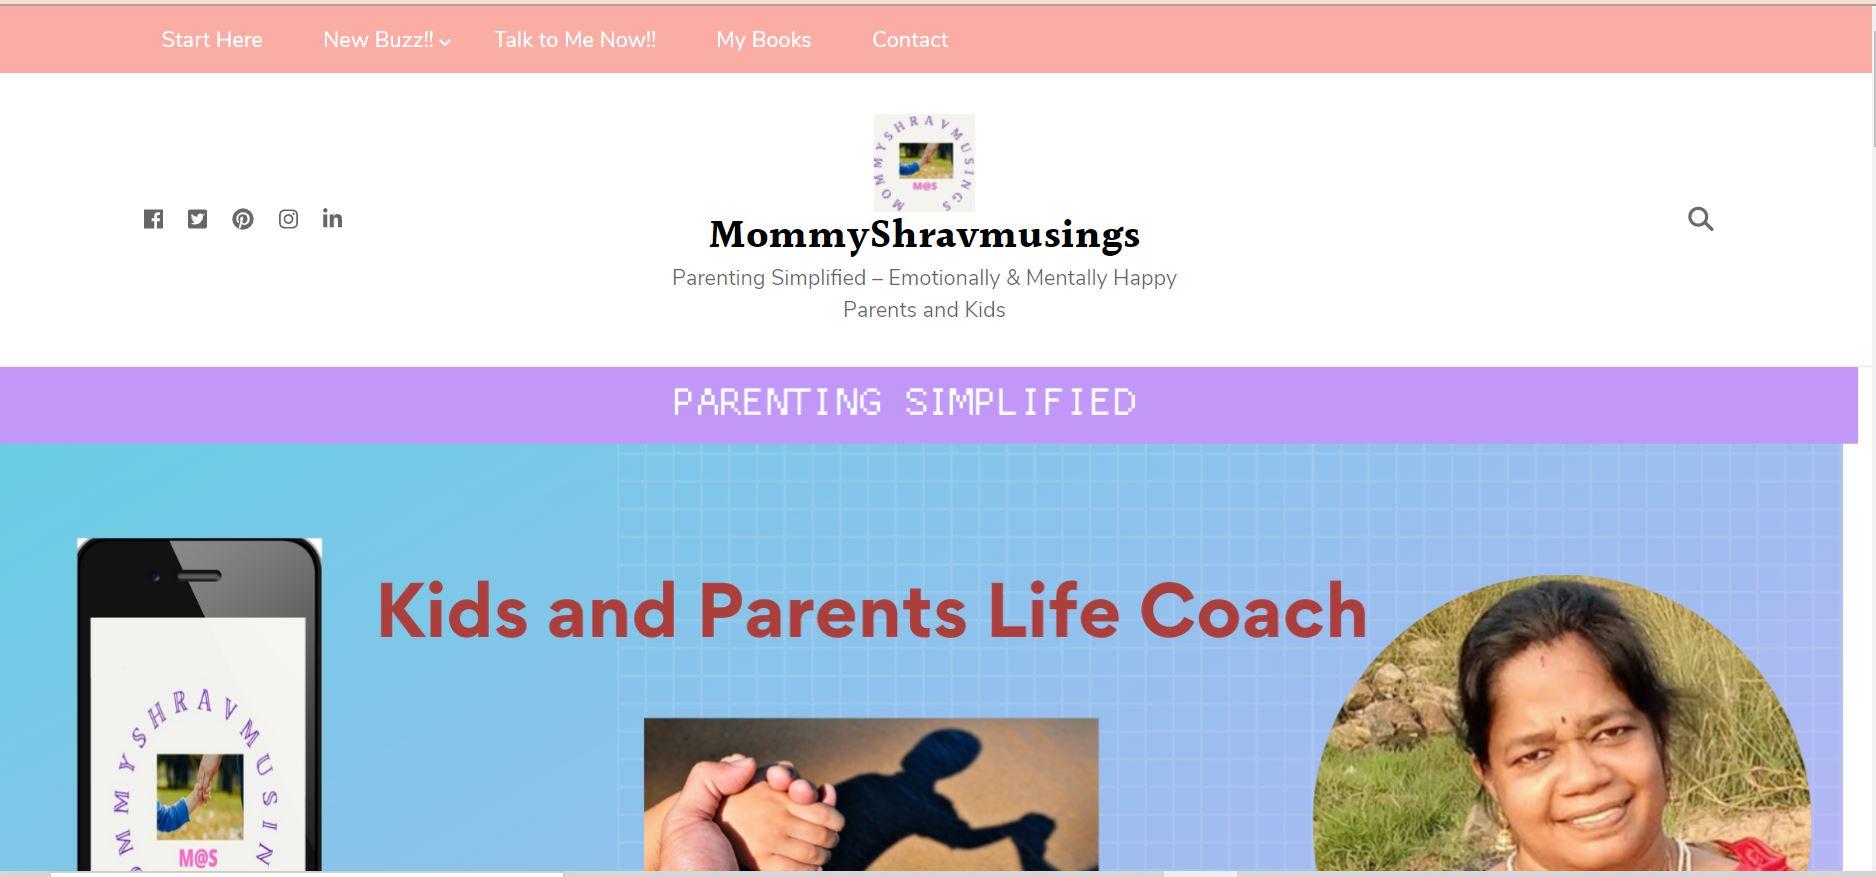 Mommyshravmusings